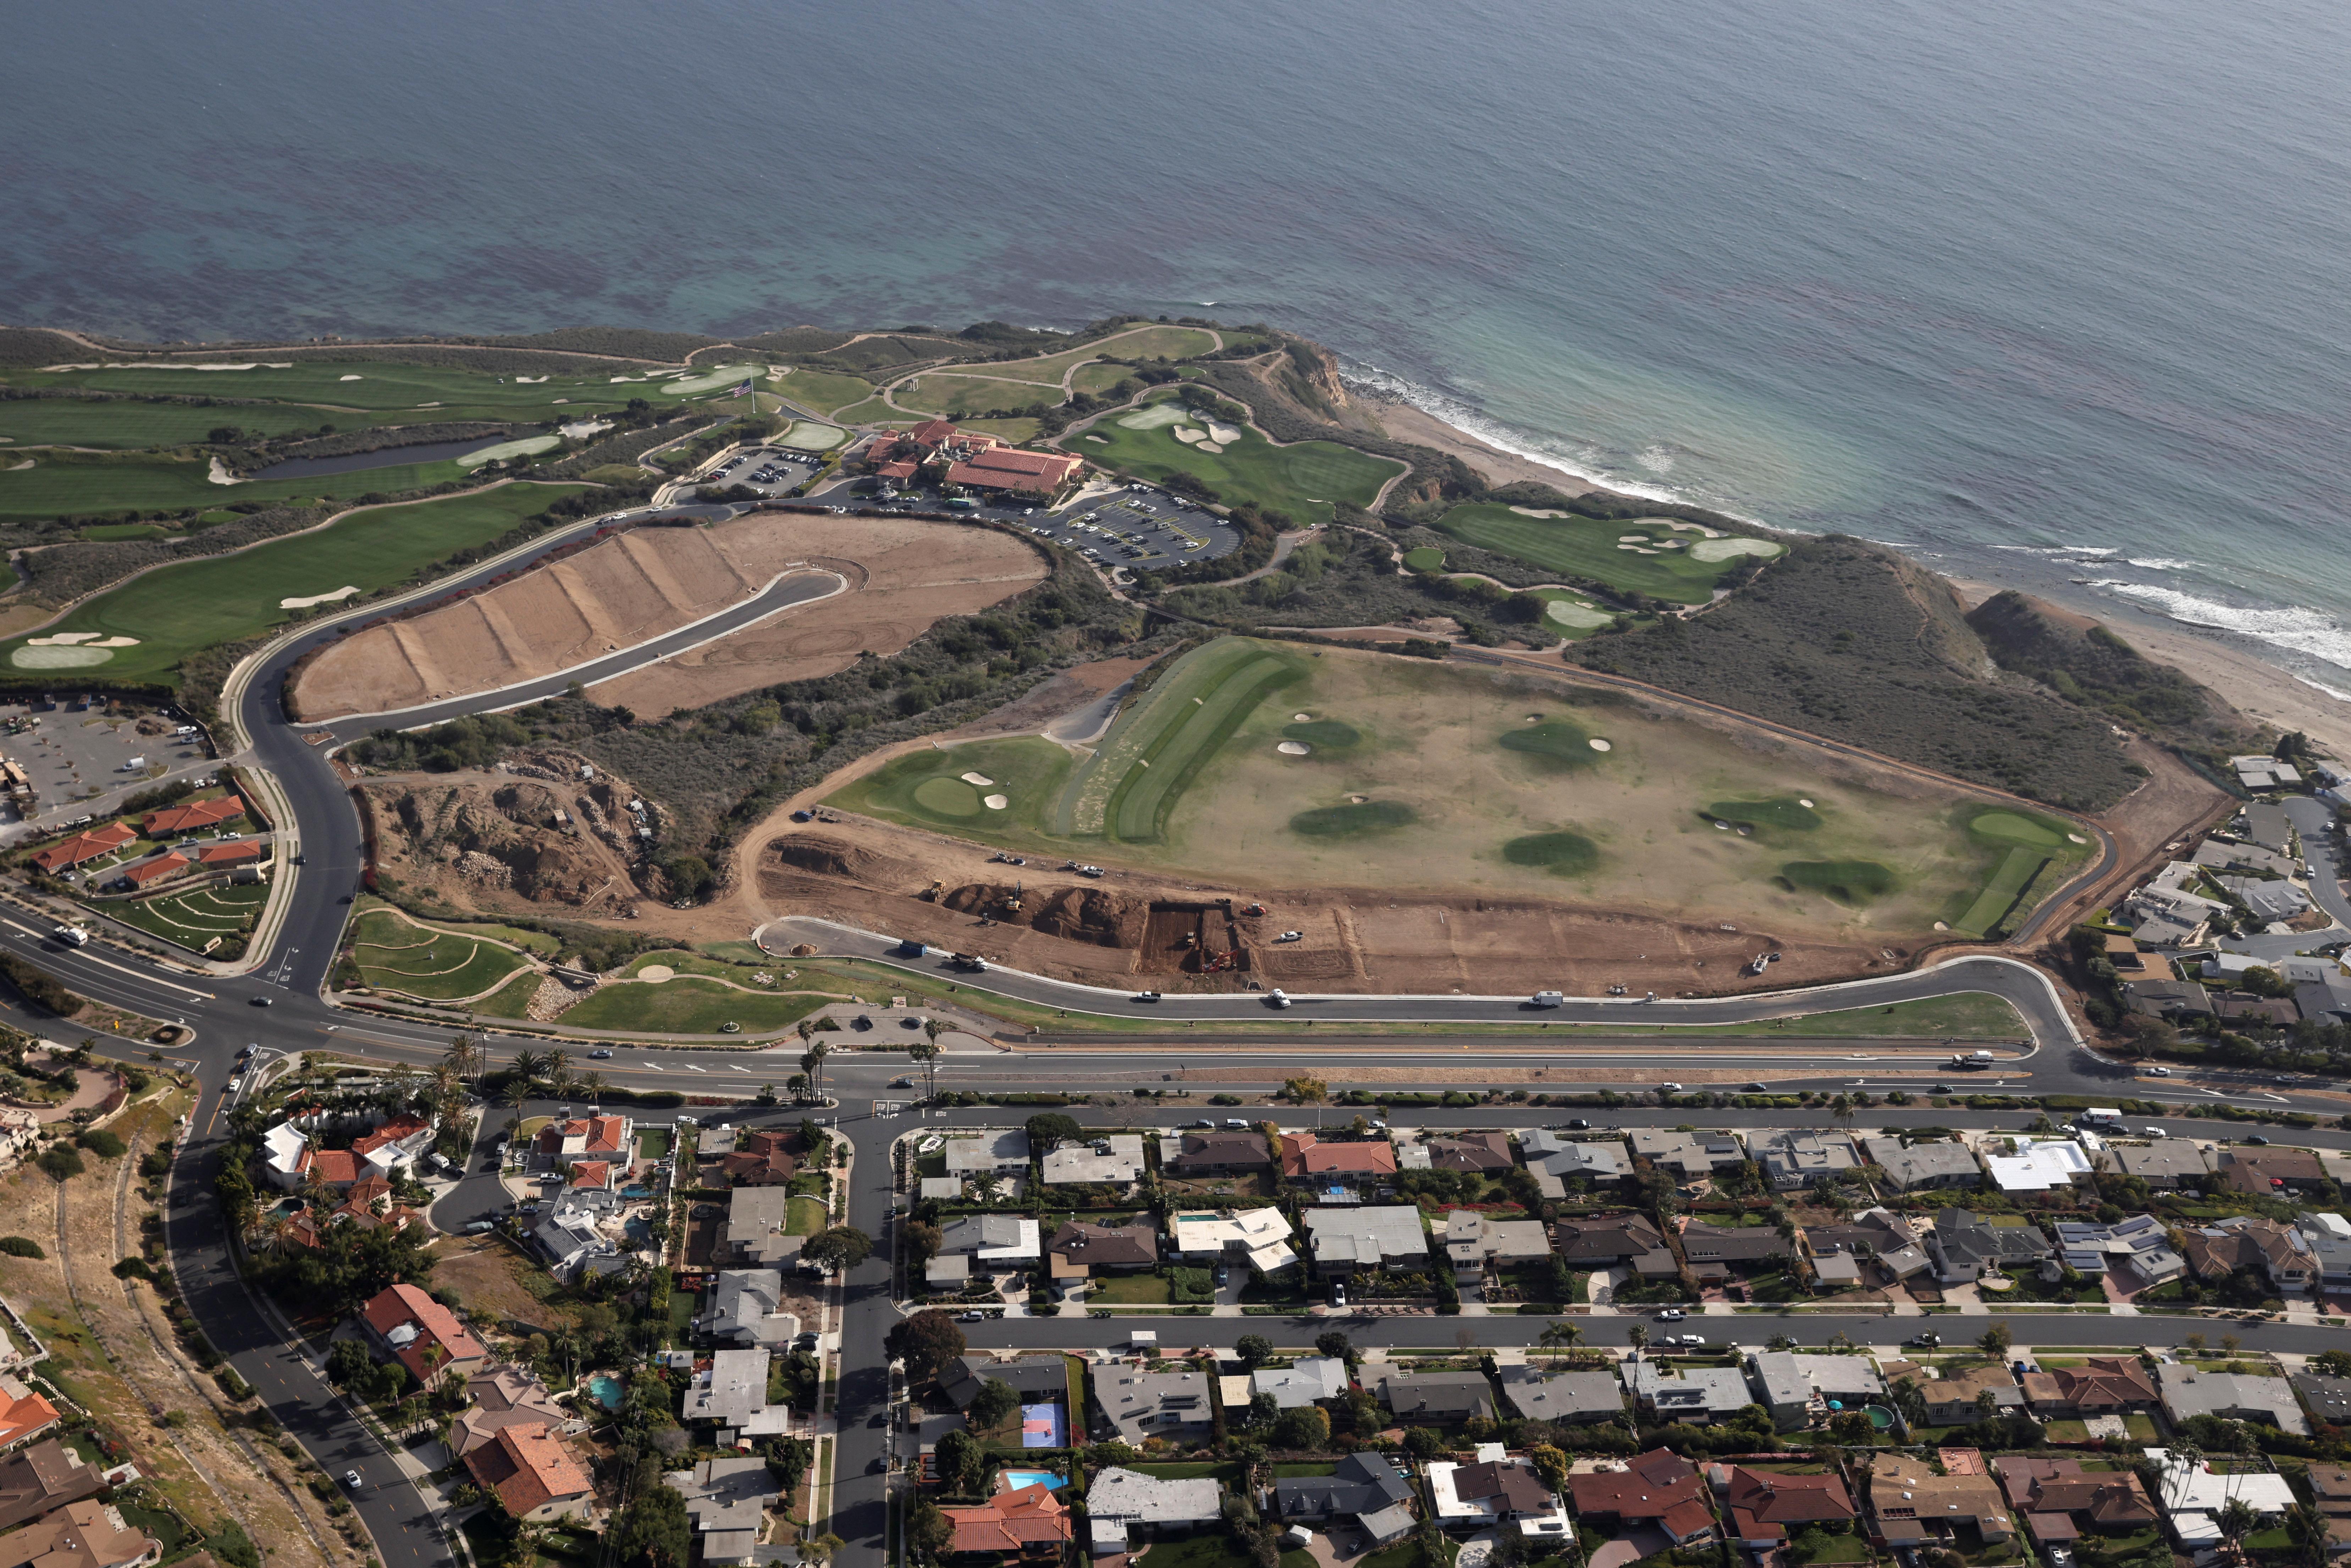 The Trump National Golf Club is seen in Rancho Palos Verdes, near Los Angeles, California, U.S., April 7, 2021. REUTERS/Lucy Nicholson